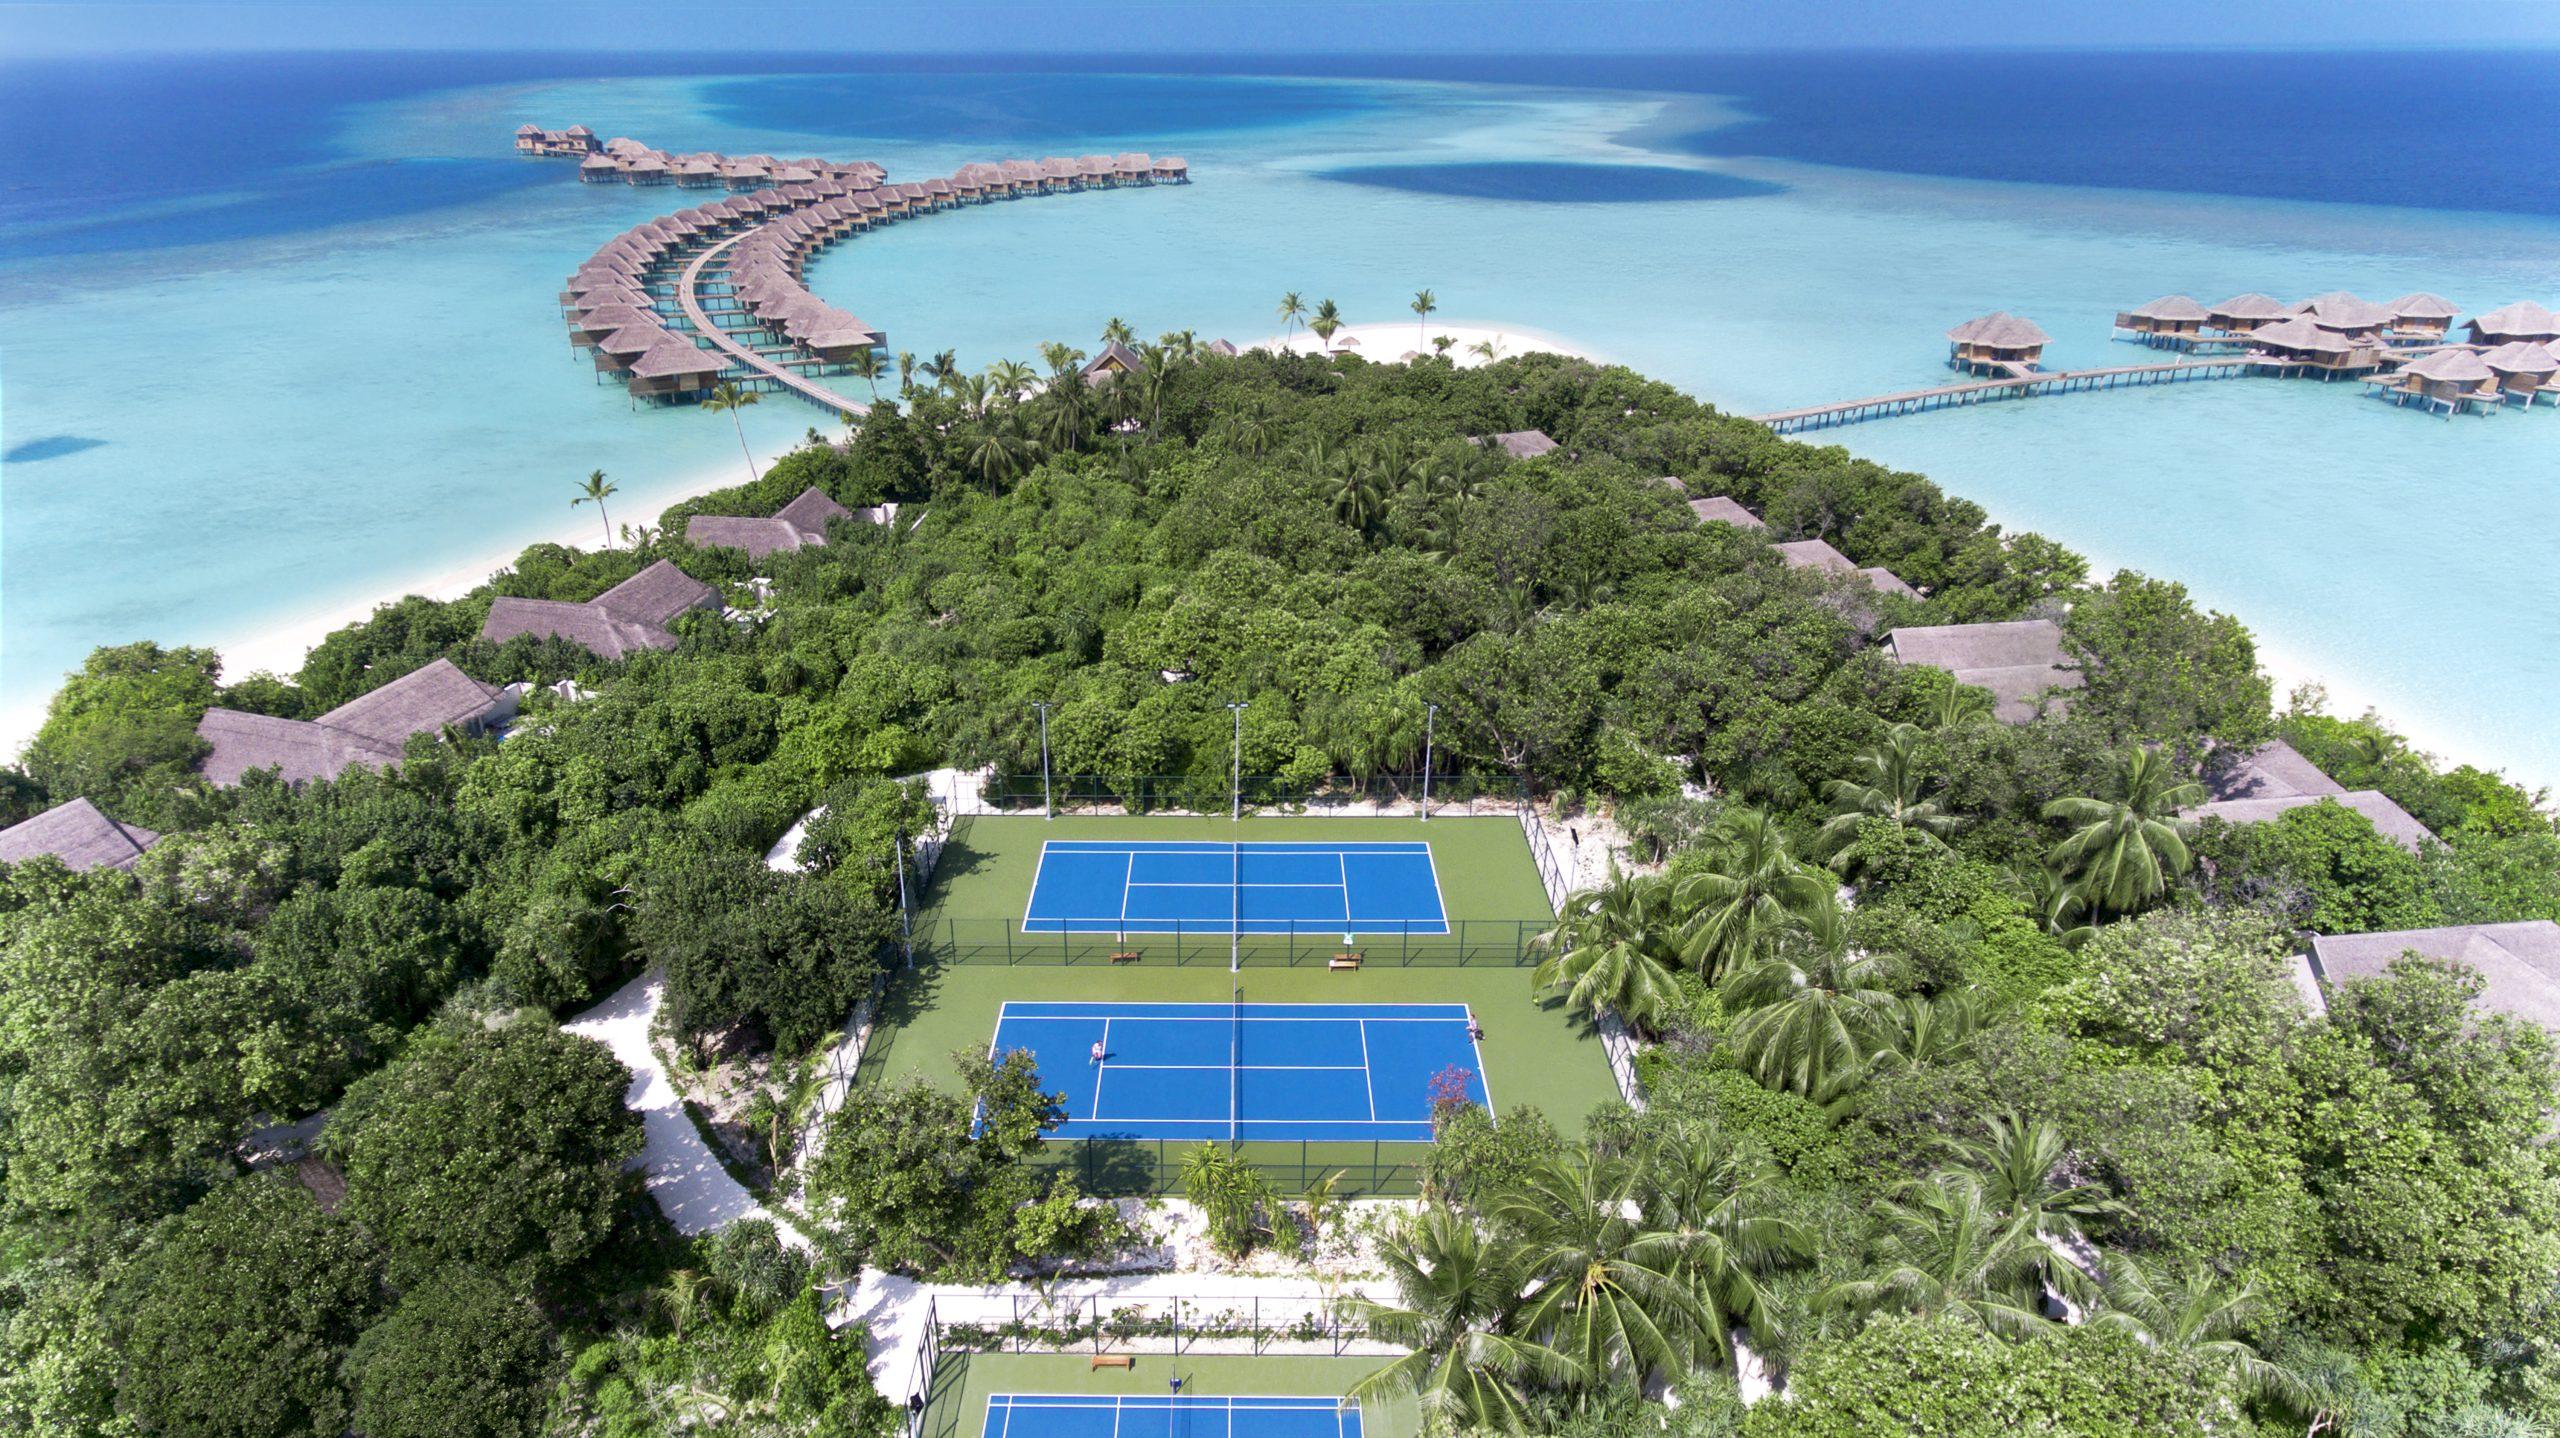 Sports Fields Aerial